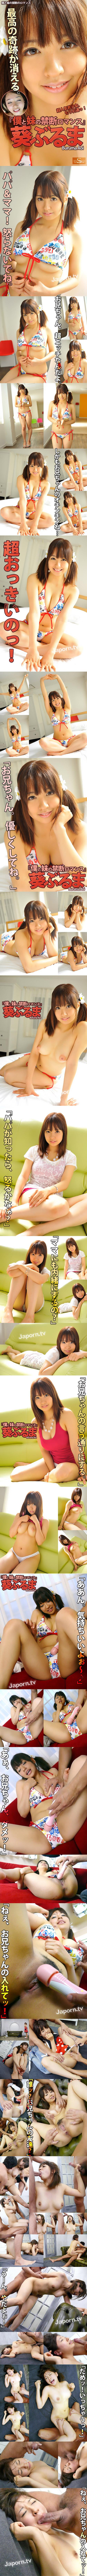 [SMD 25] Super Model Media. S Model 25 僕と妹の禁断ロマンス: 葵ぶるま 葵ぶるま SMD